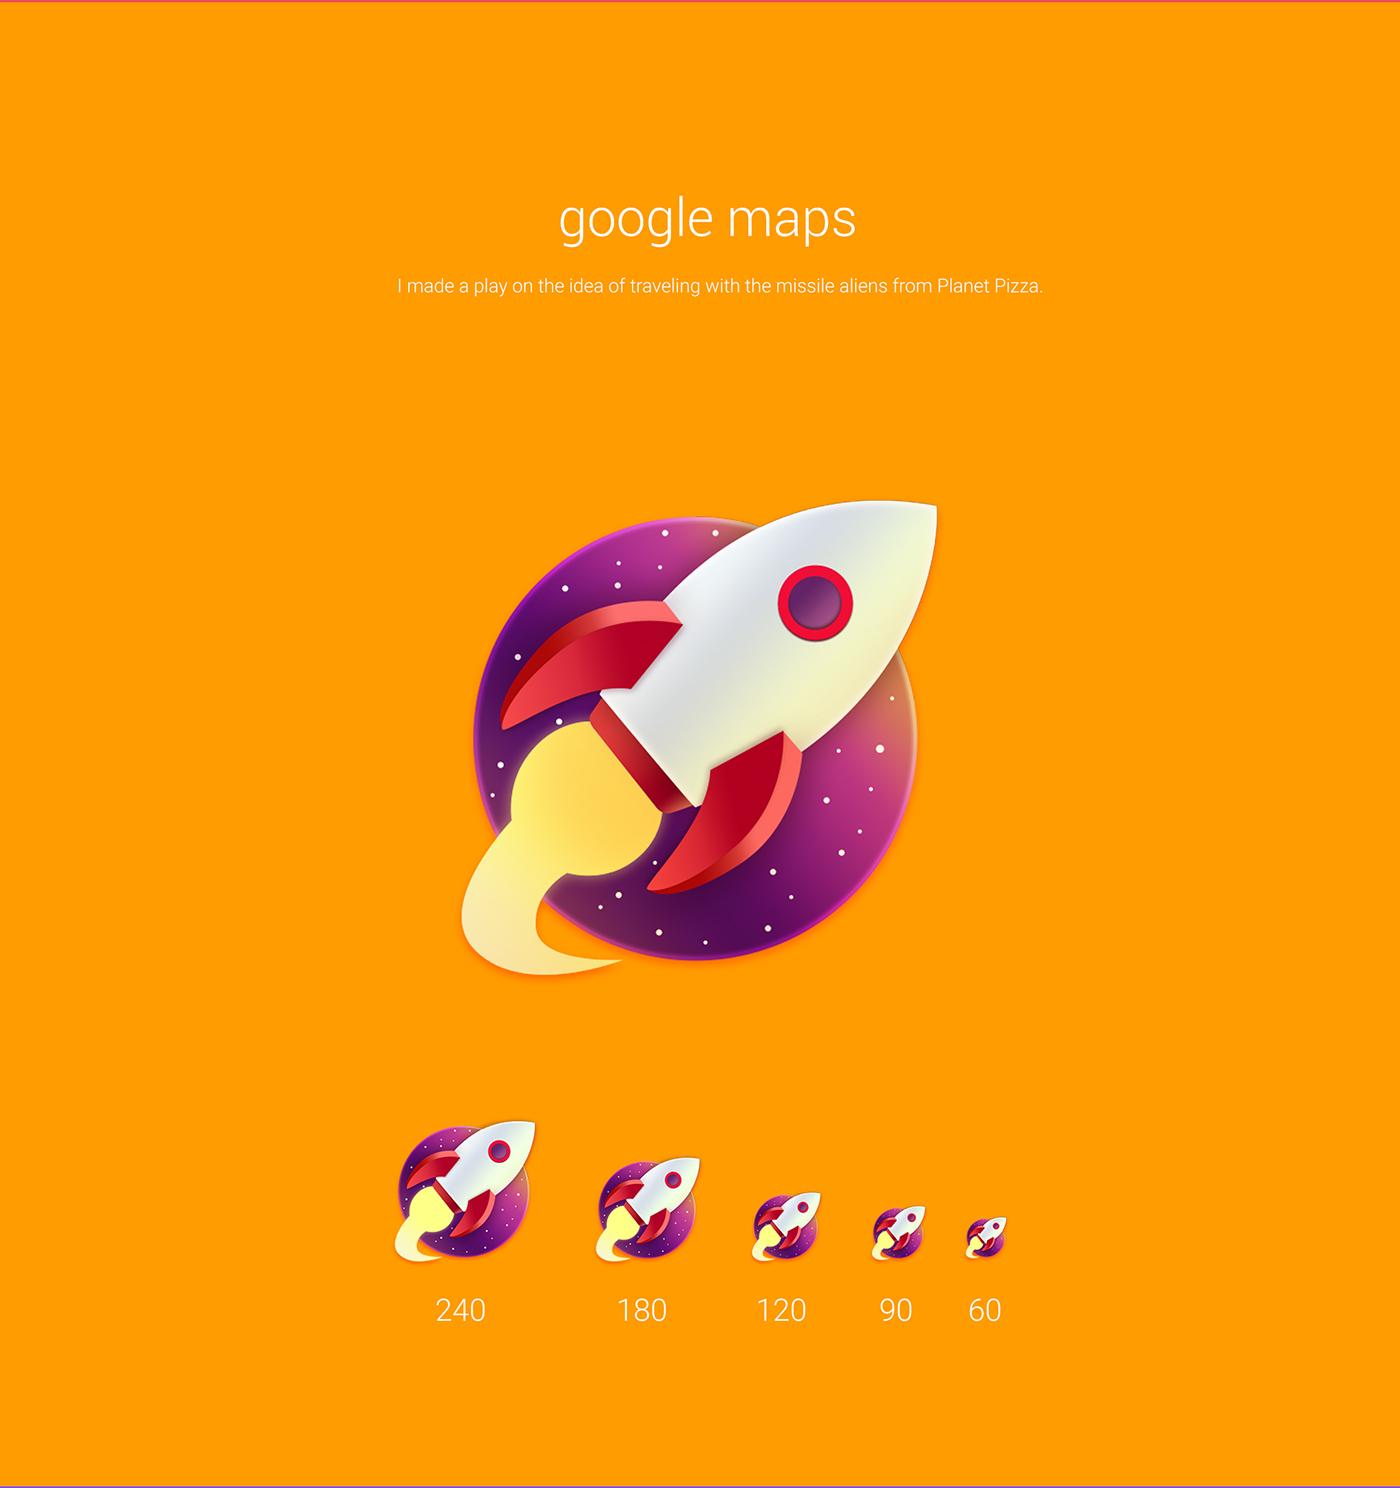 disney-pixar-toy-story-android-icons-leo-natsume-04